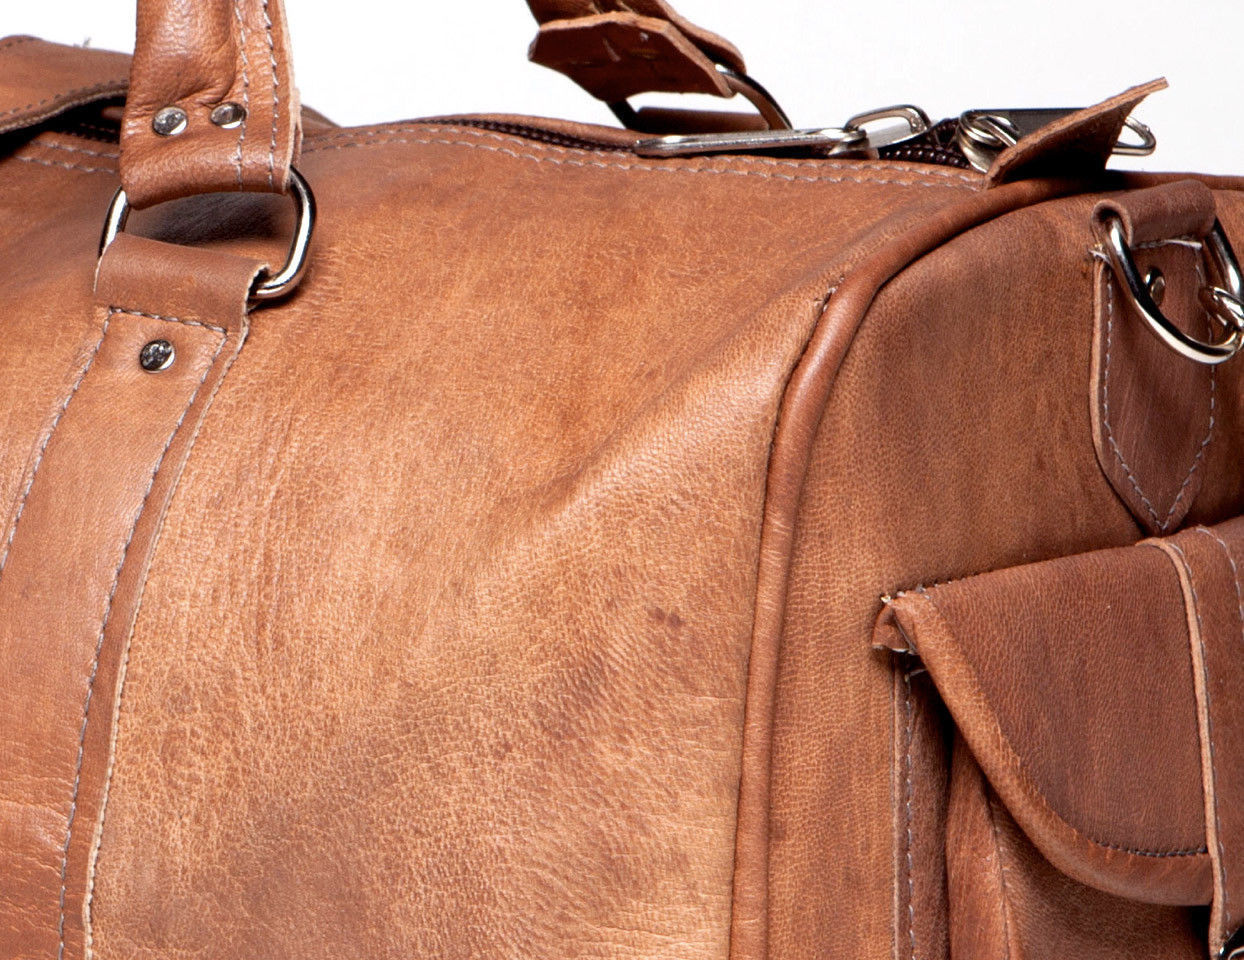 New Men 100/ Rustic Soft Vintage Leather Travel Duffel Weekend Luggage Gym Bag